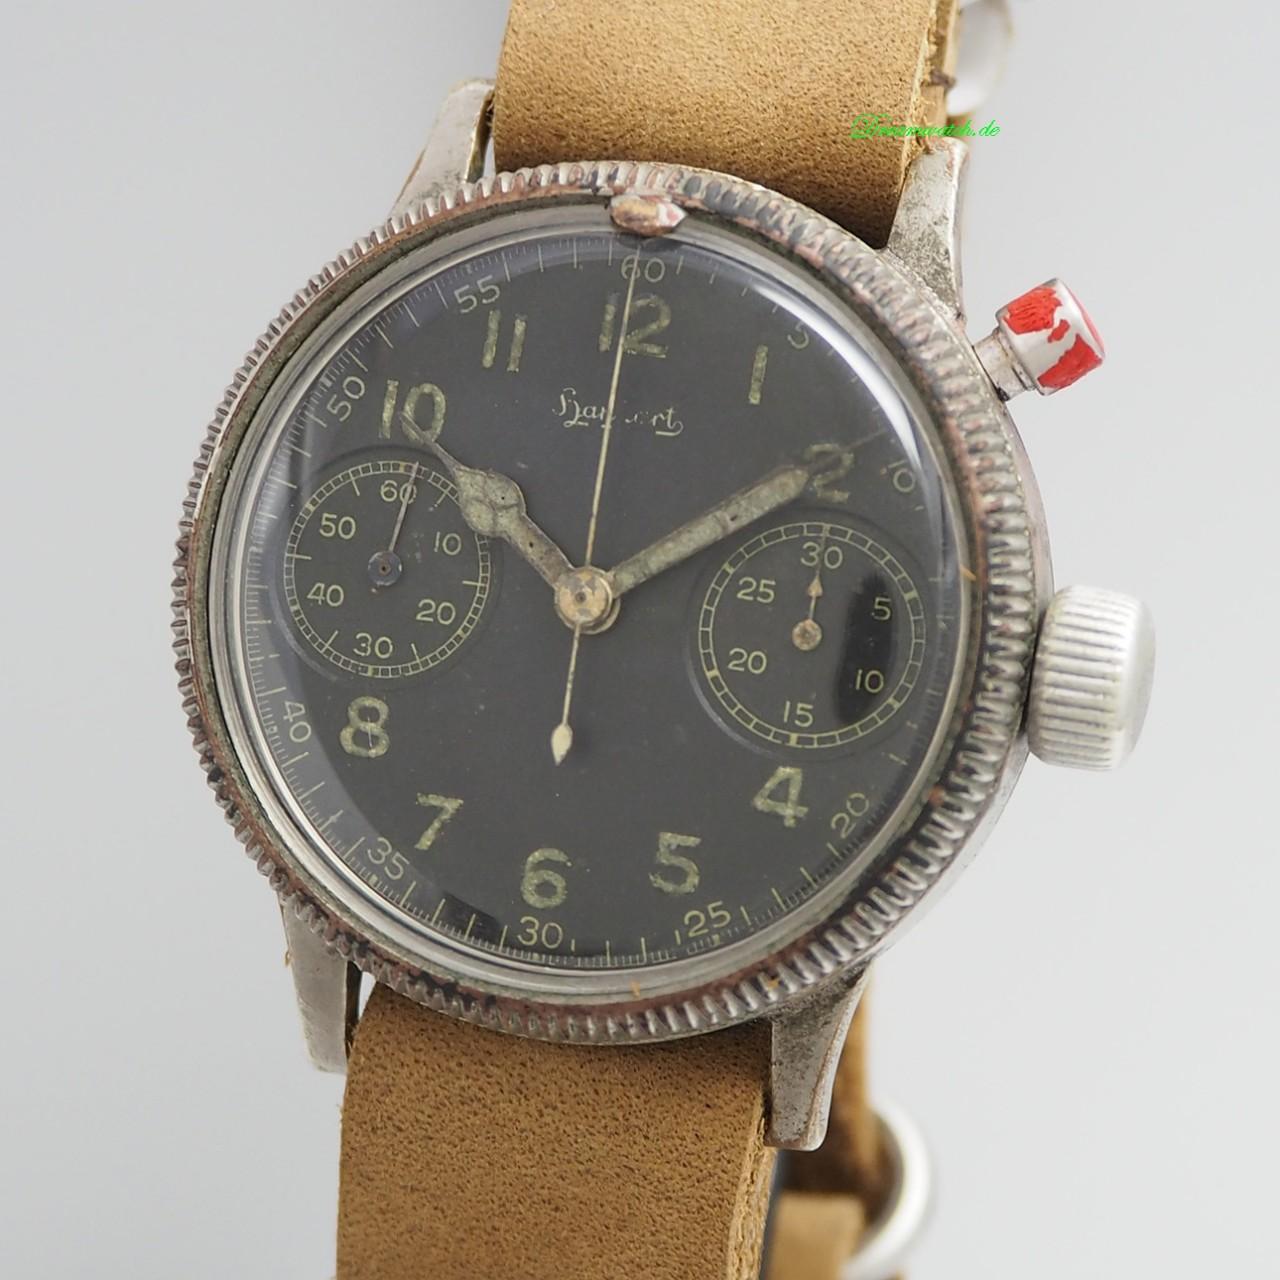 Hanhart Vintage Monopusher/ Eindrücker Chronograph WW2 Cal.40/50